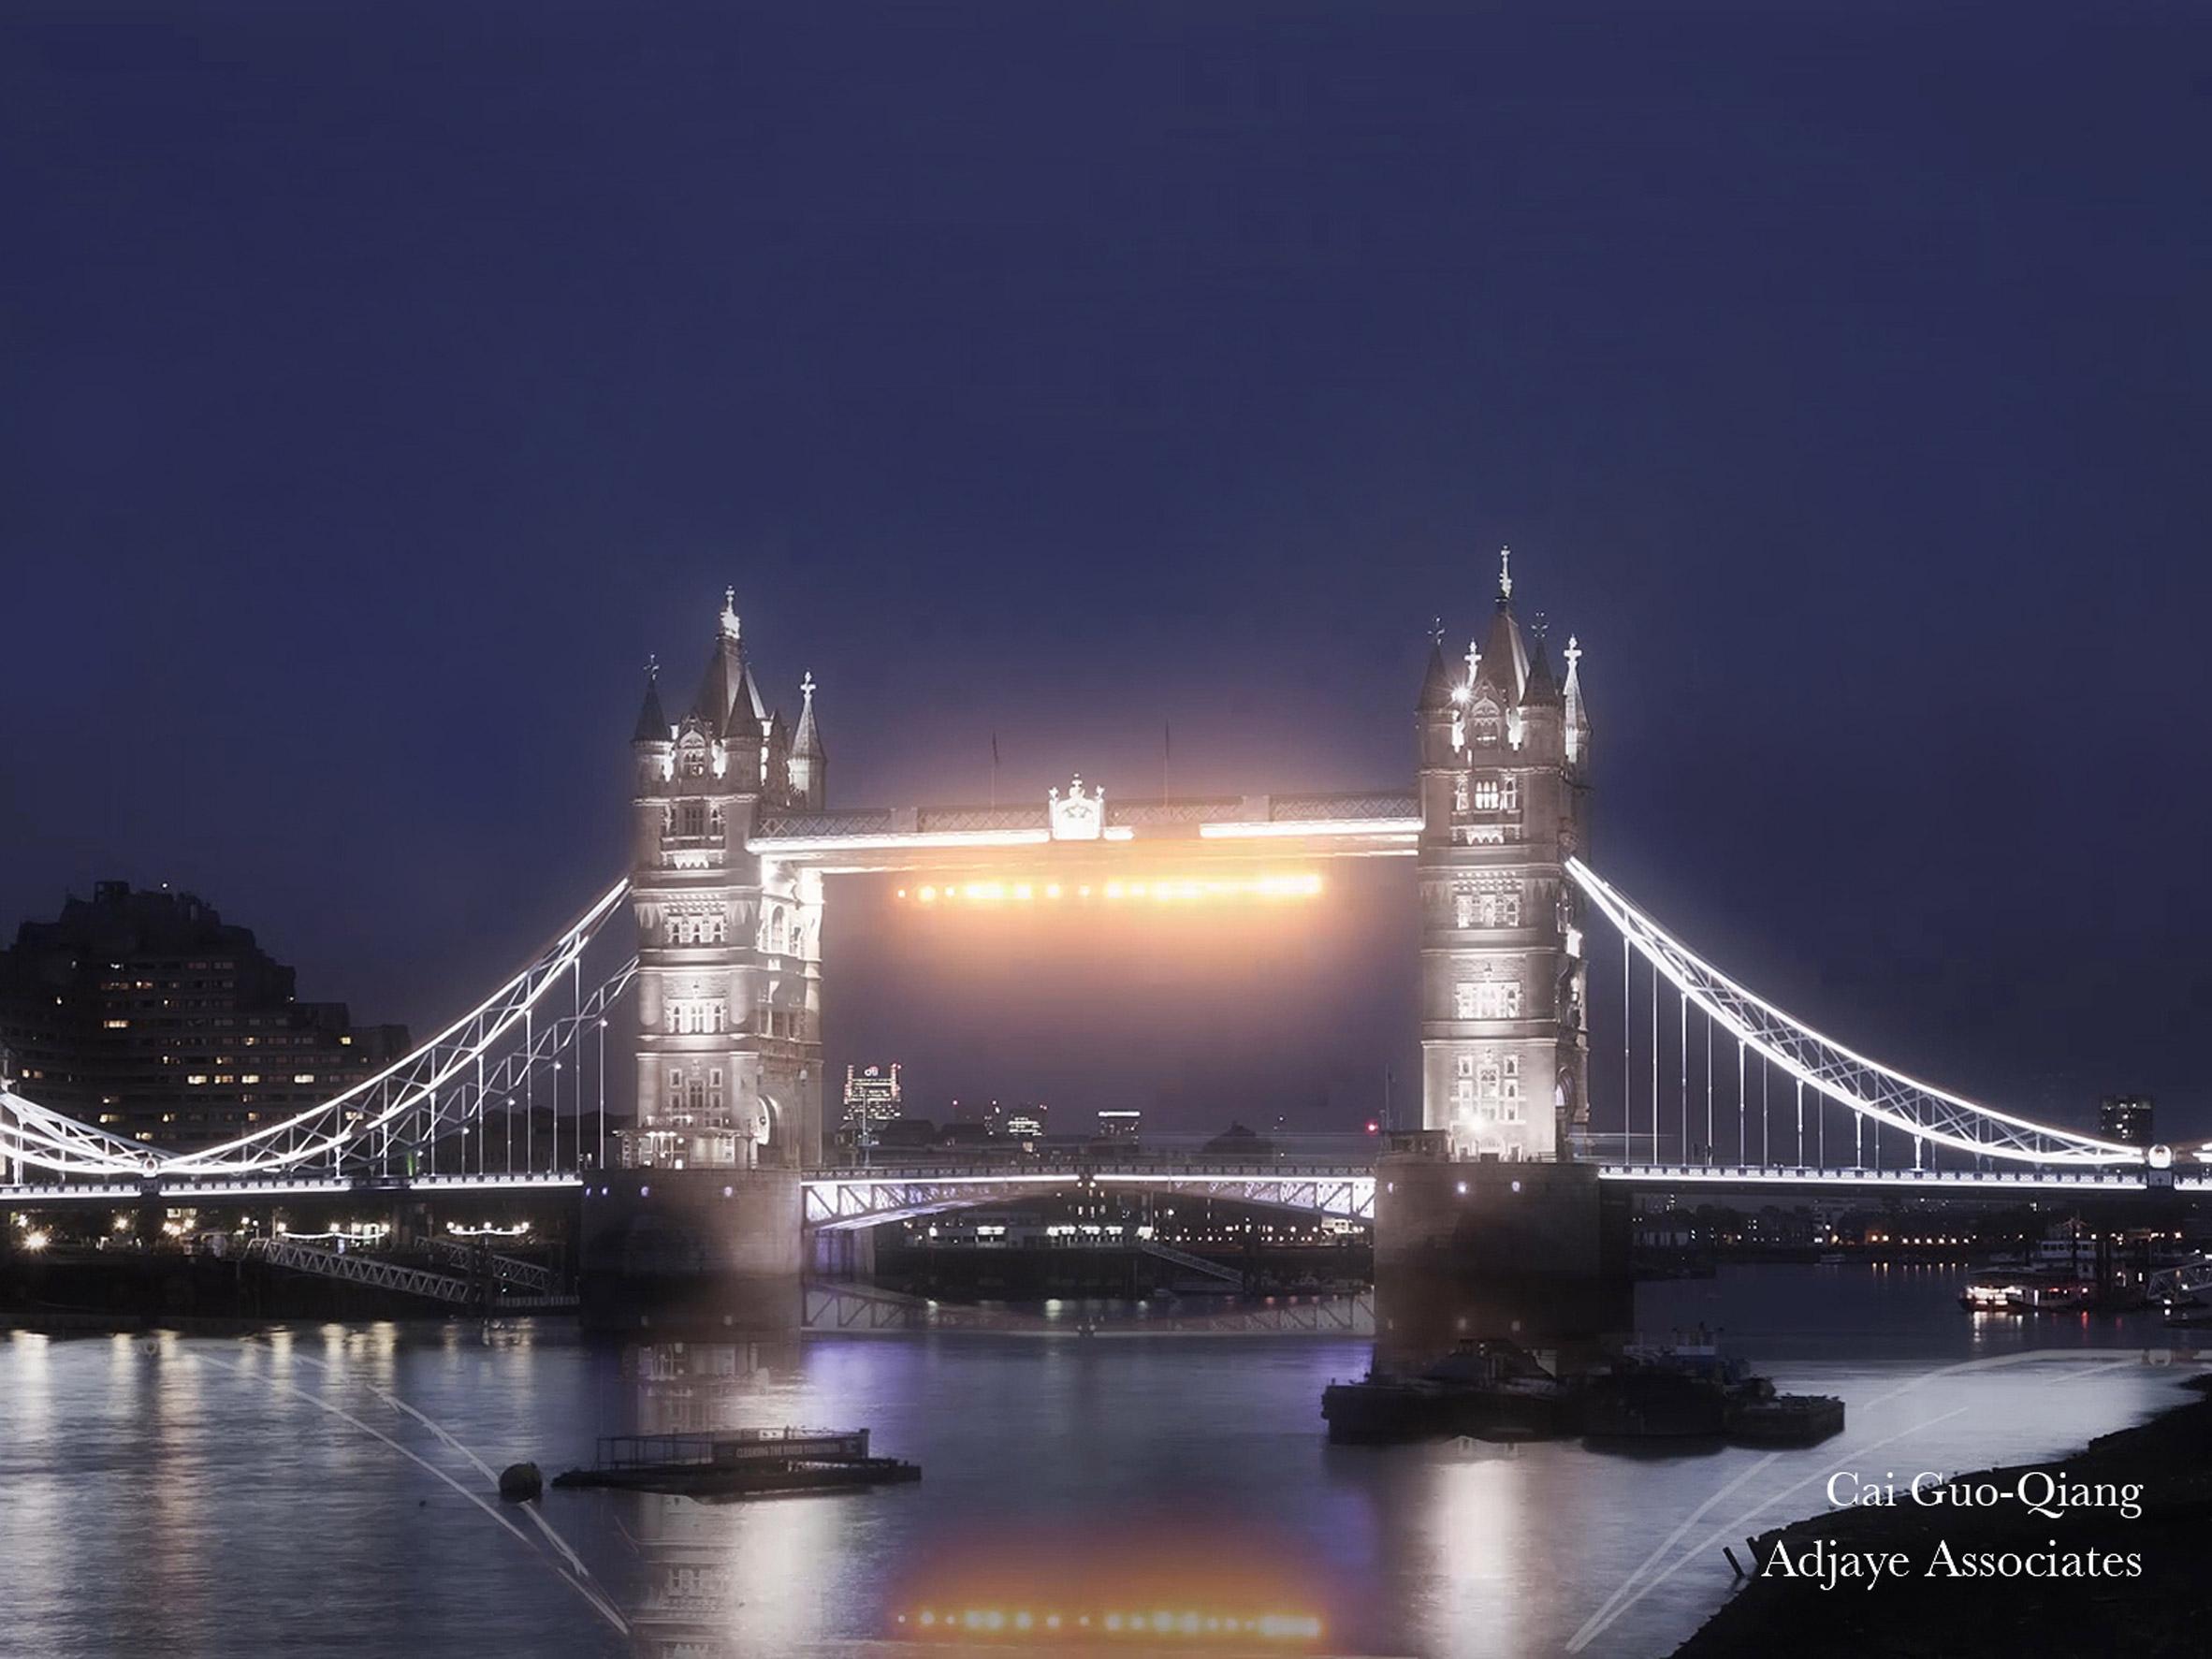 David Adjaye and Amanda Levete compete in London bridge lighting contest